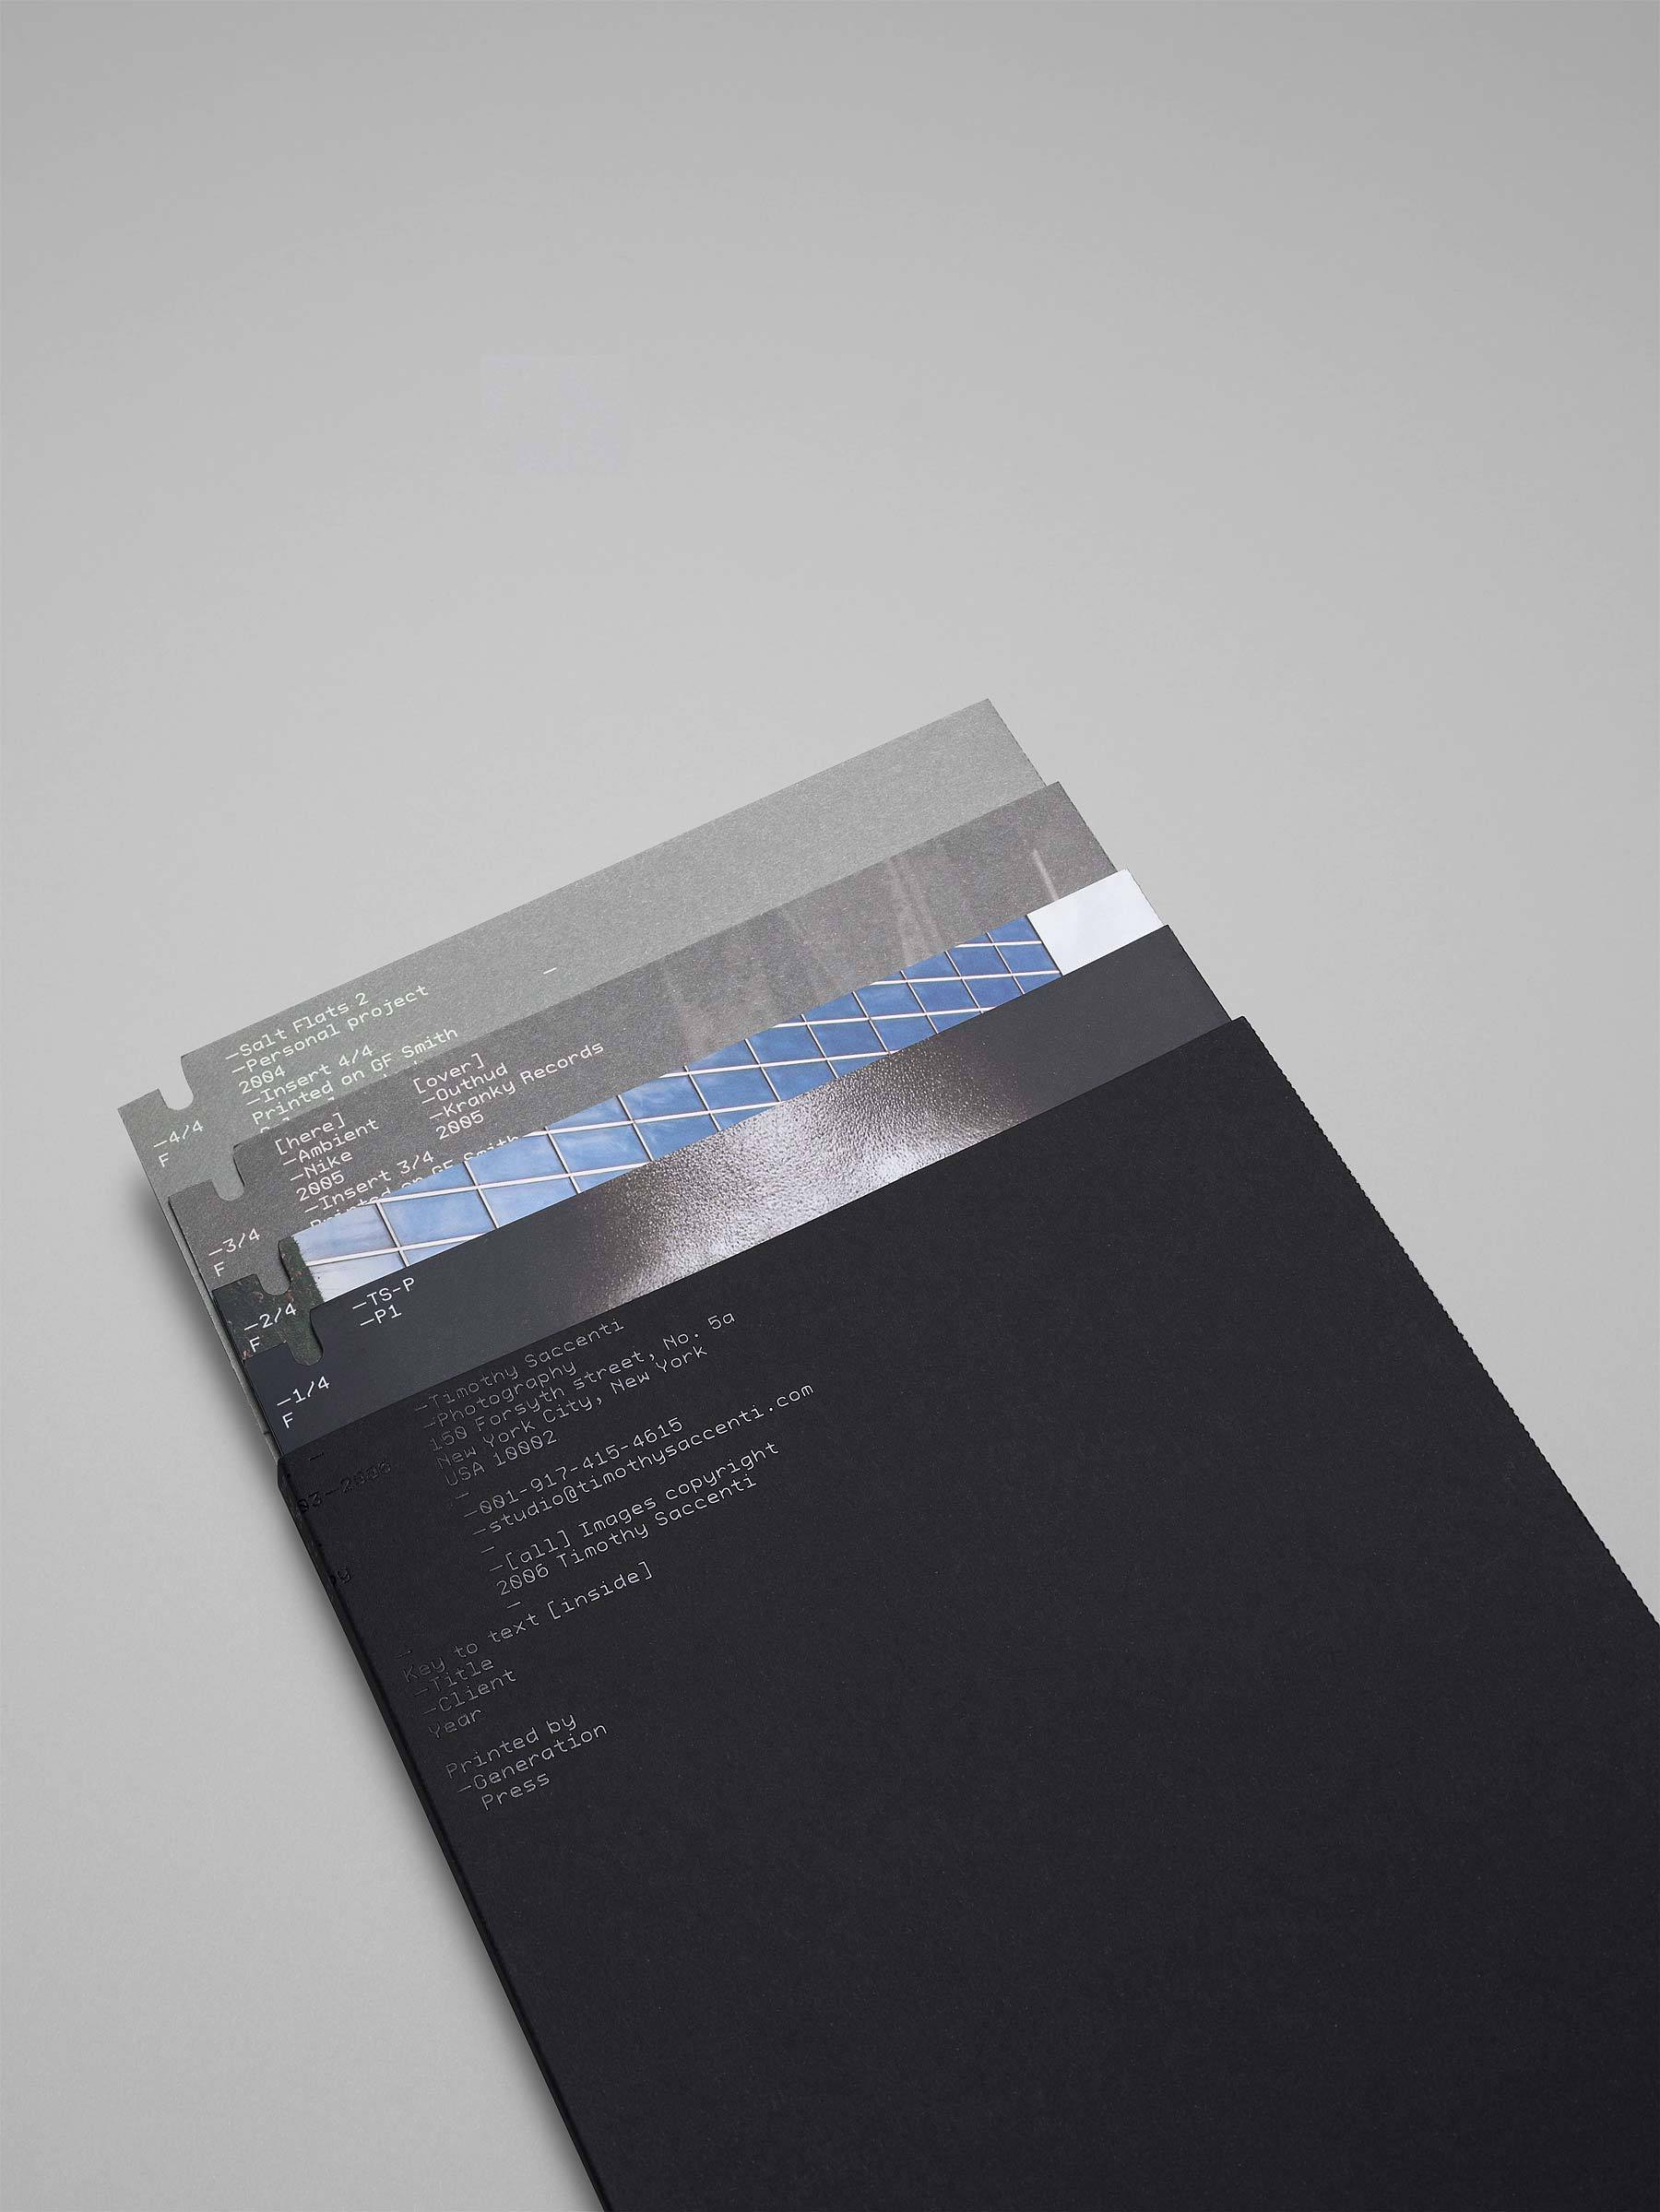 Build— +44(0)208 521 1040 / Promo One-Book